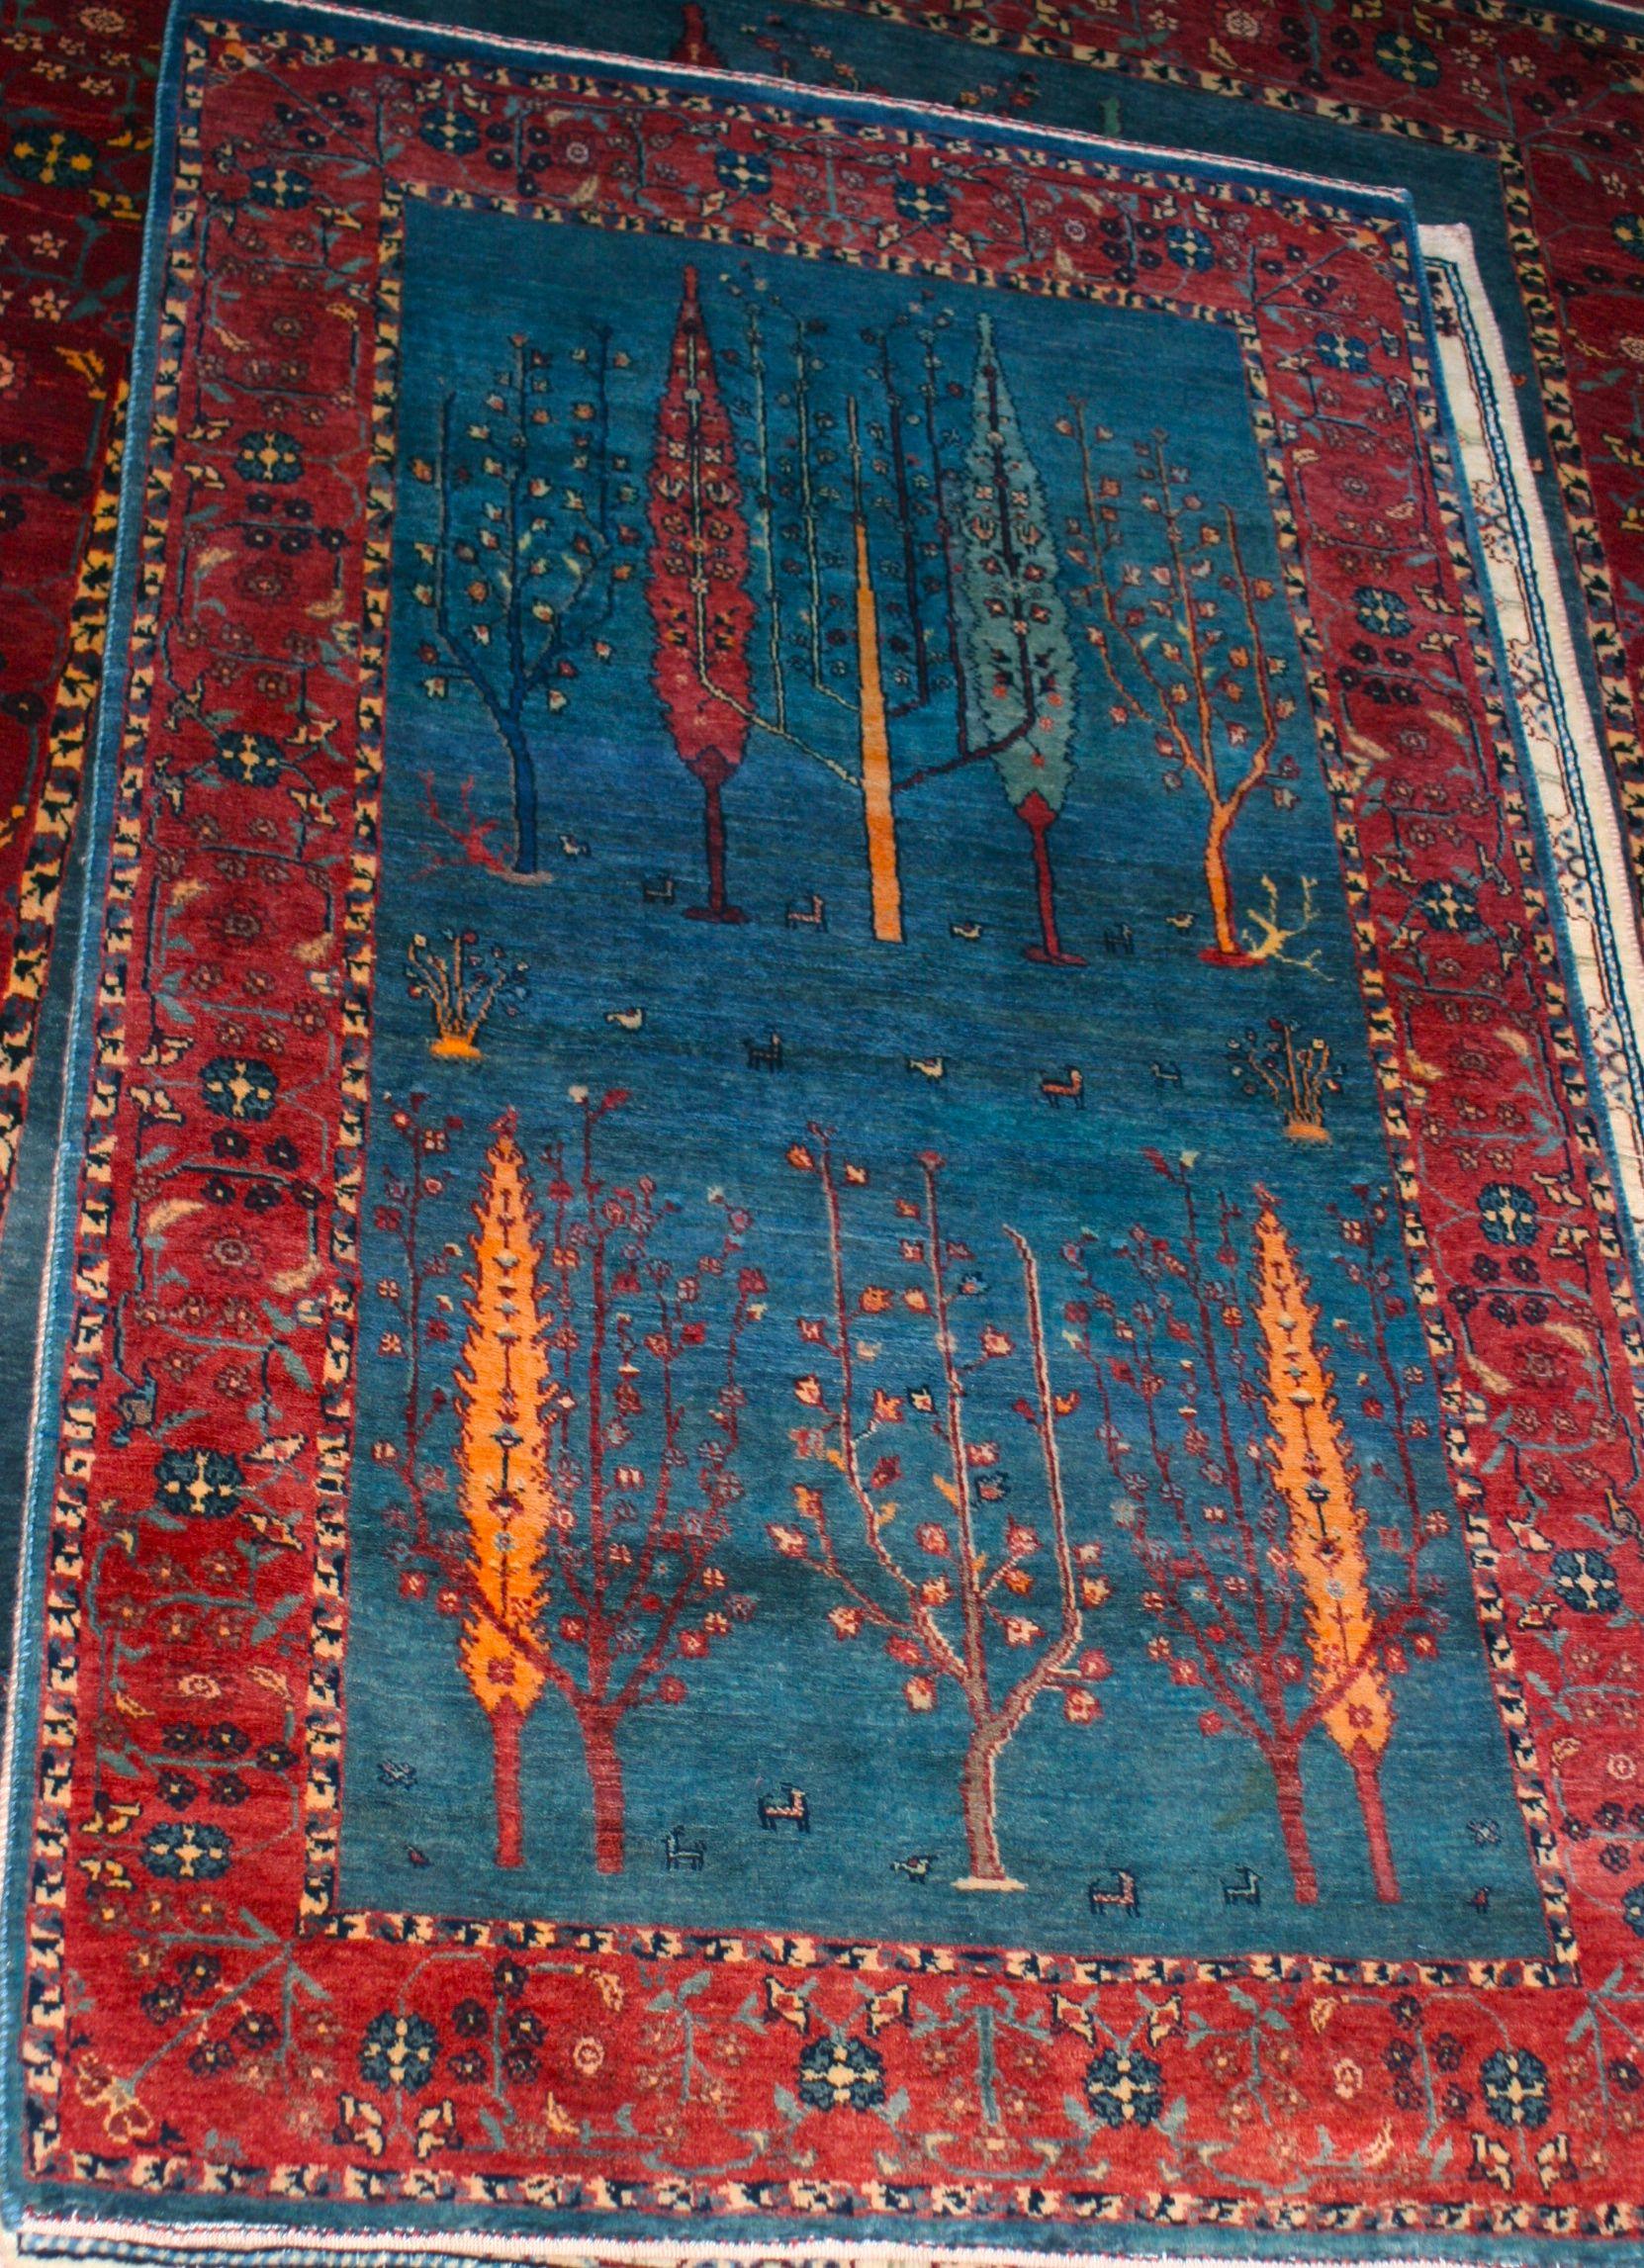 Photos Of Persian Gabbeh Rugs Gabbeh Rug From Iran